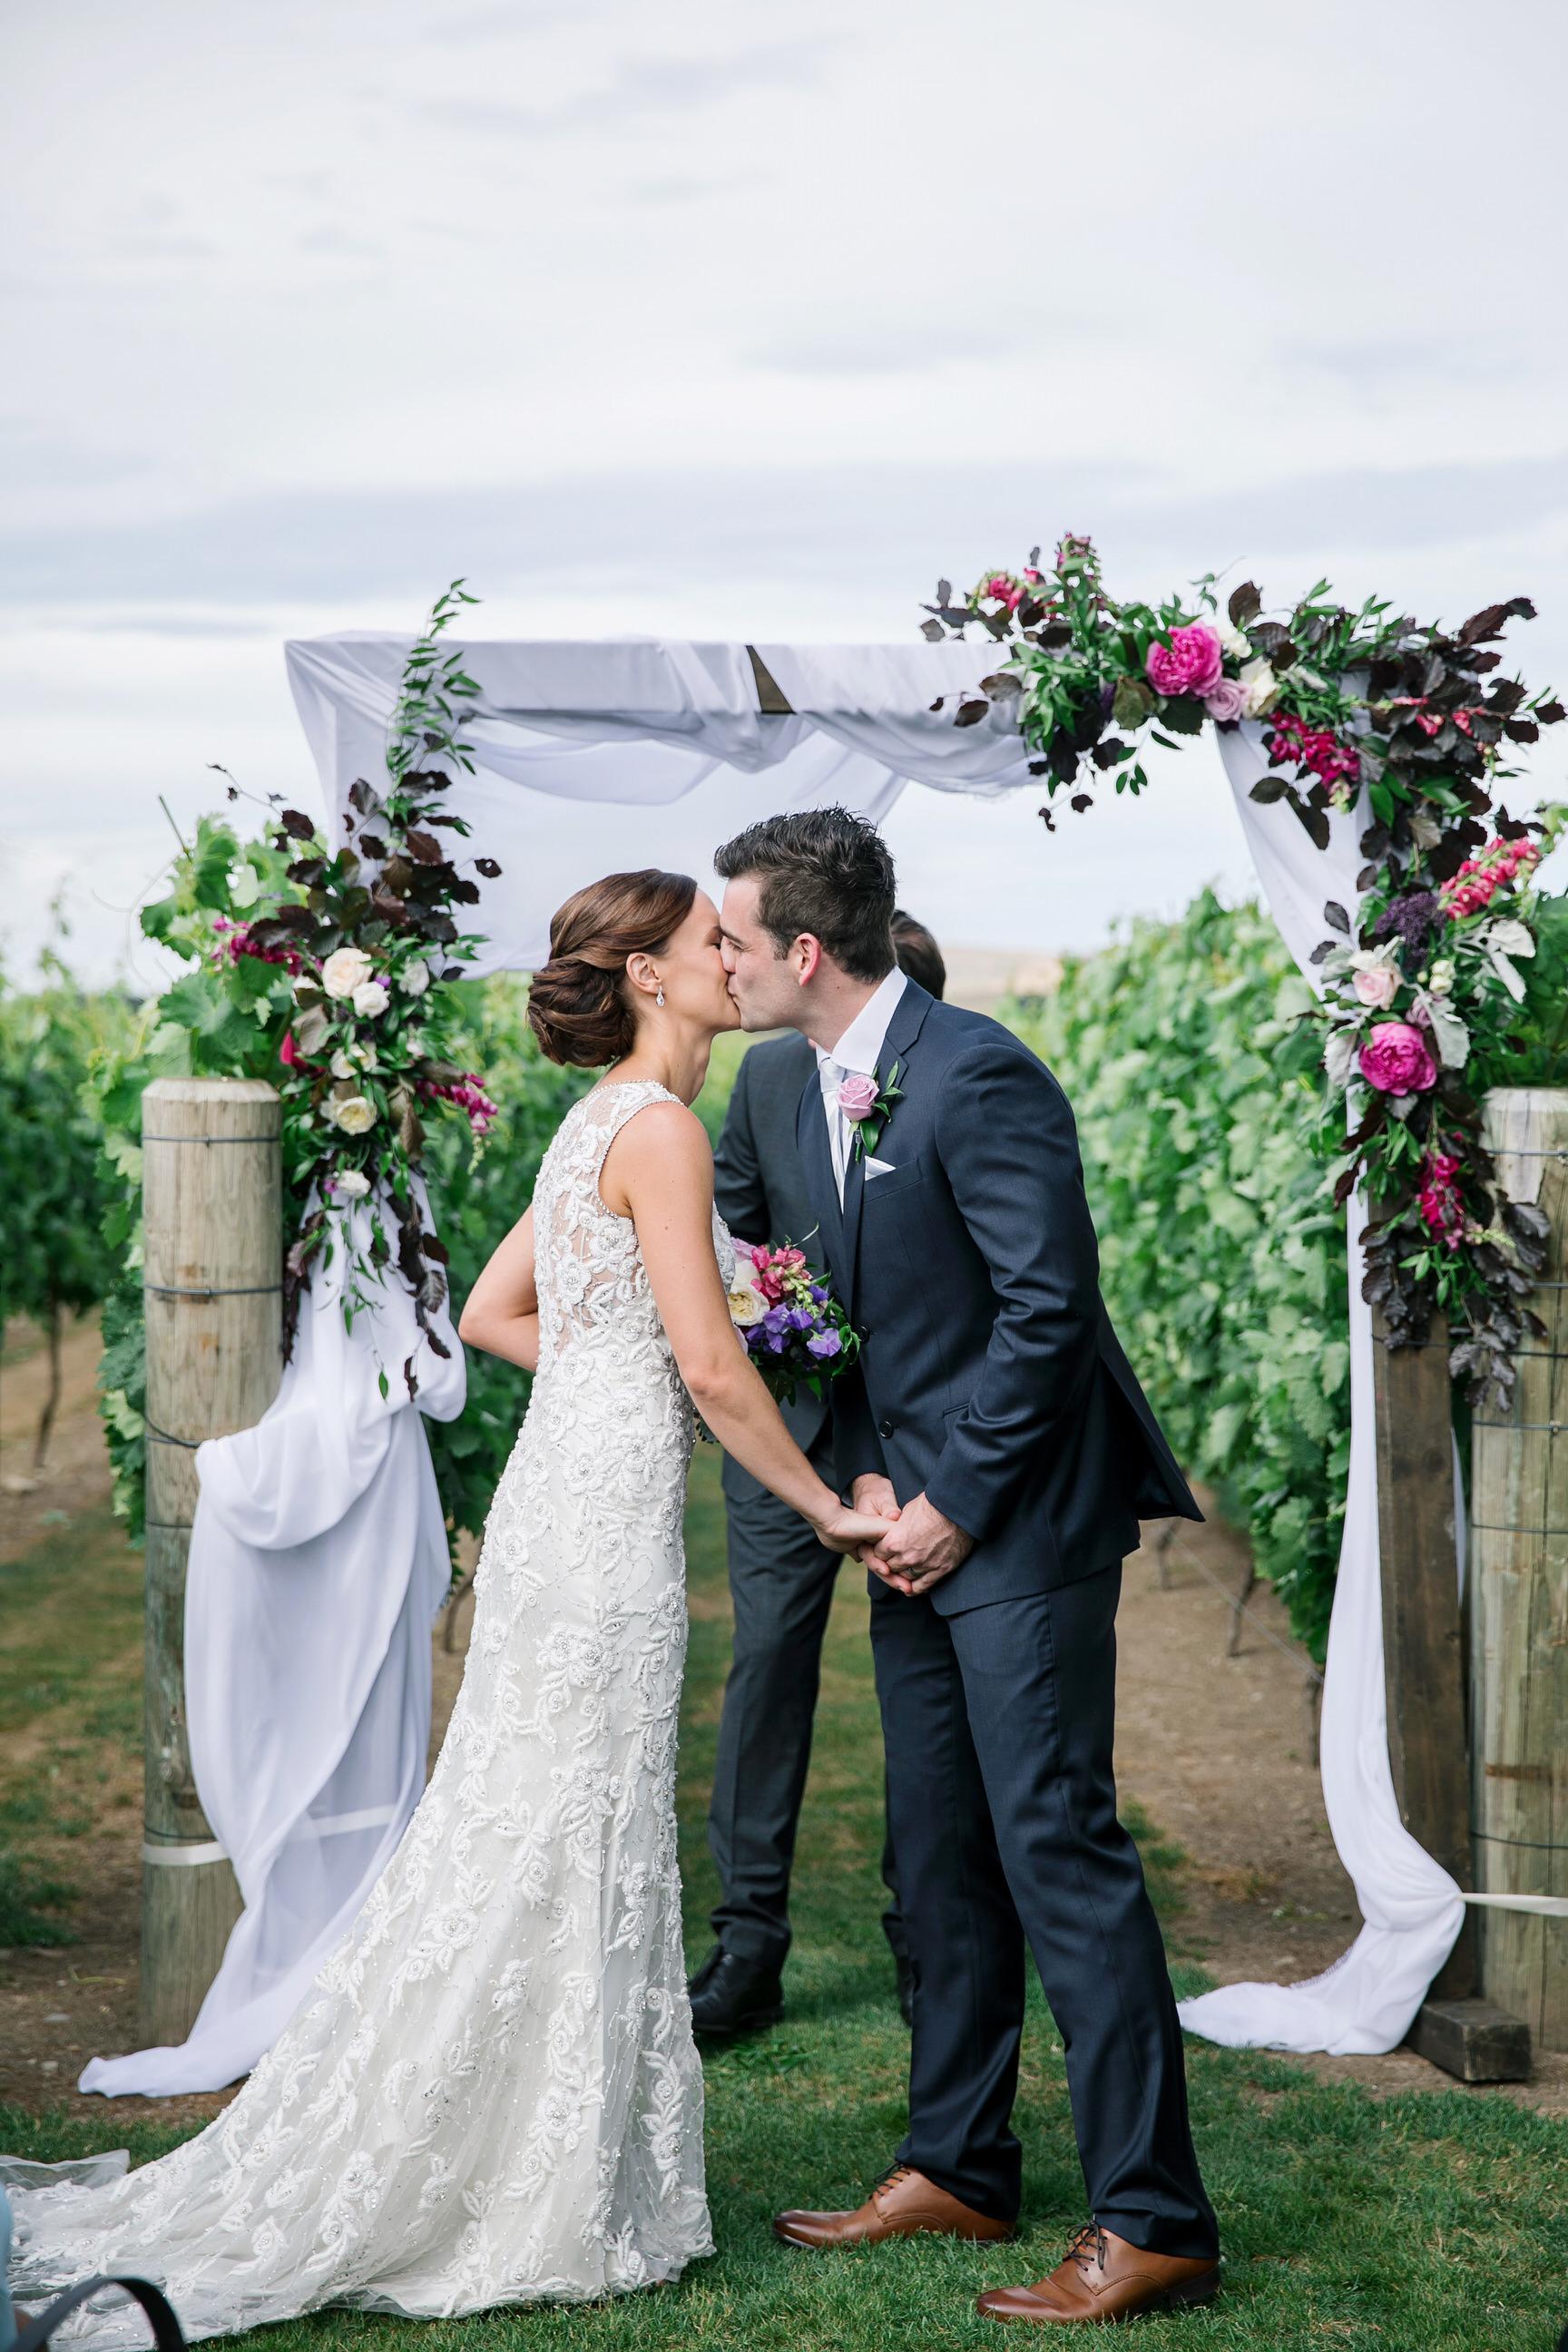 Martinborough-Poppies-Wedding-Caine-Eloise-Toni-Larsen-0086.jpg